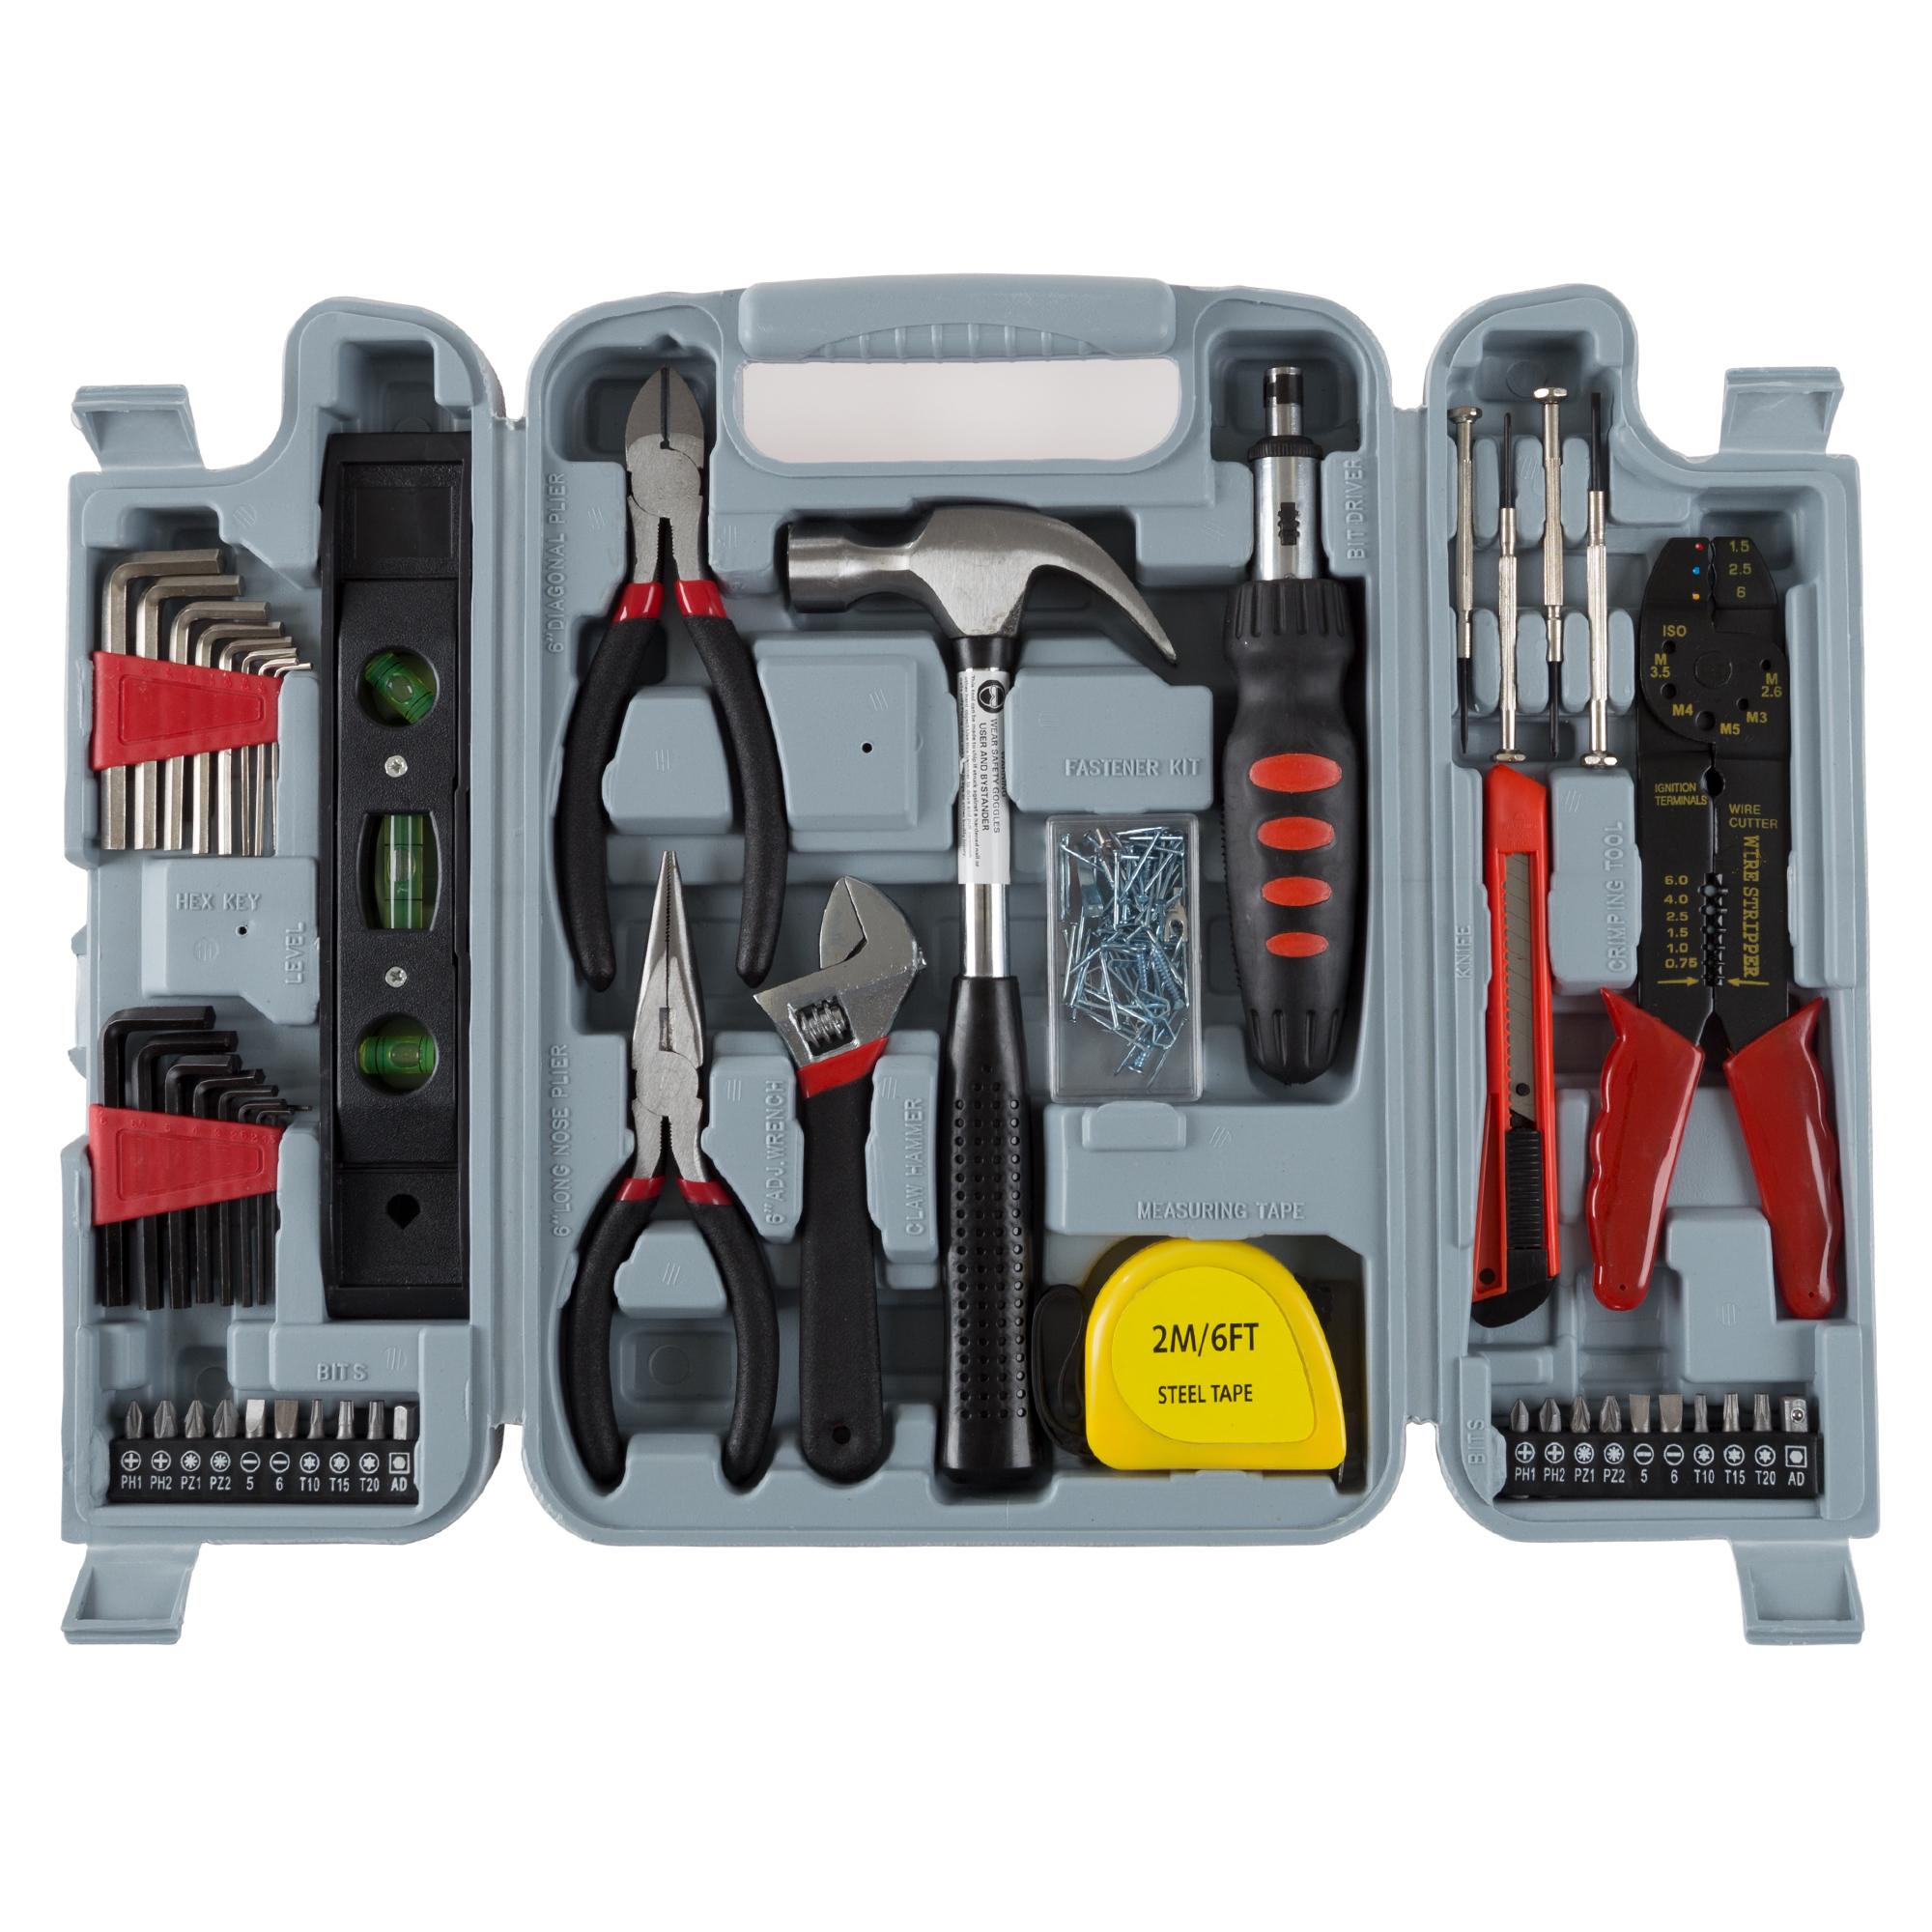 Stalwart 75-6037 130-Piece Hand Tool Set